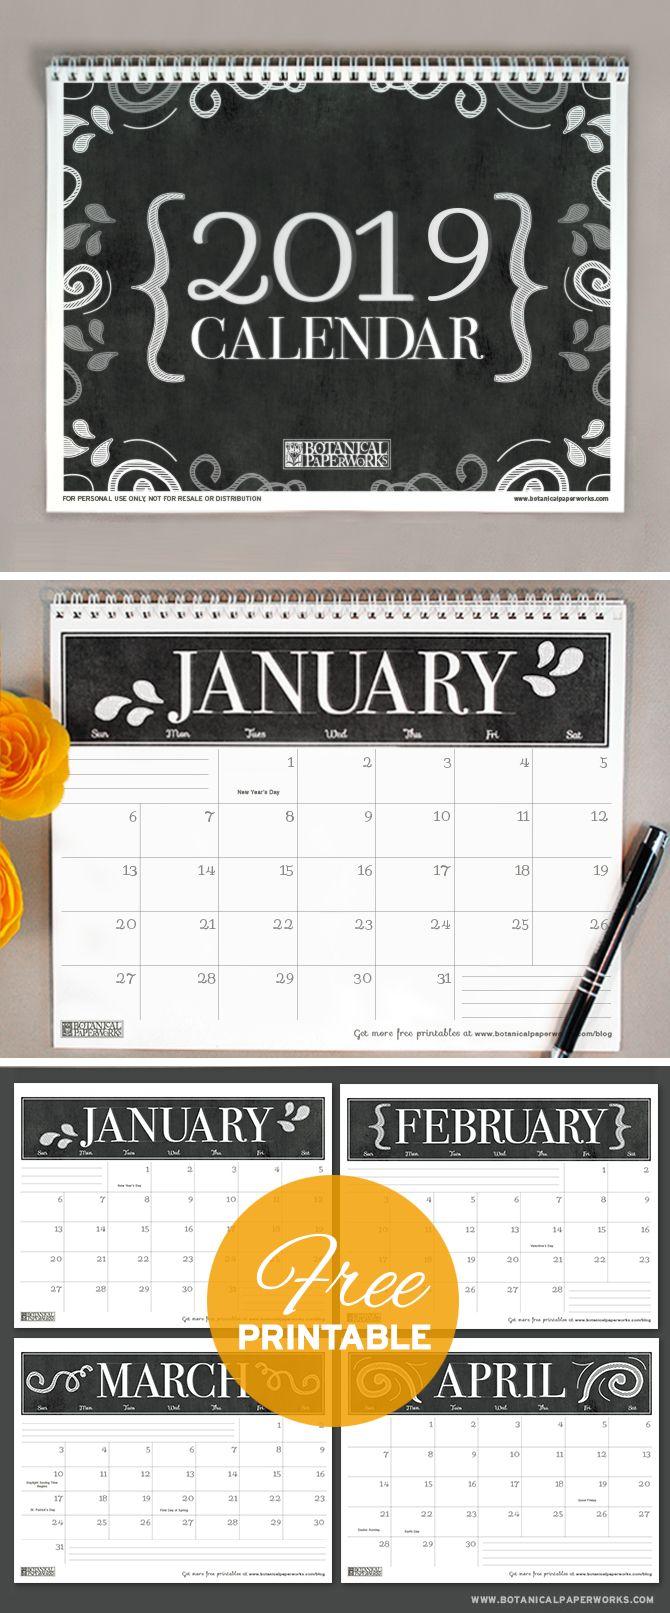 Free Printables 2019 Calendars Free Printable Calendar Calendar Printables Printable Calendar